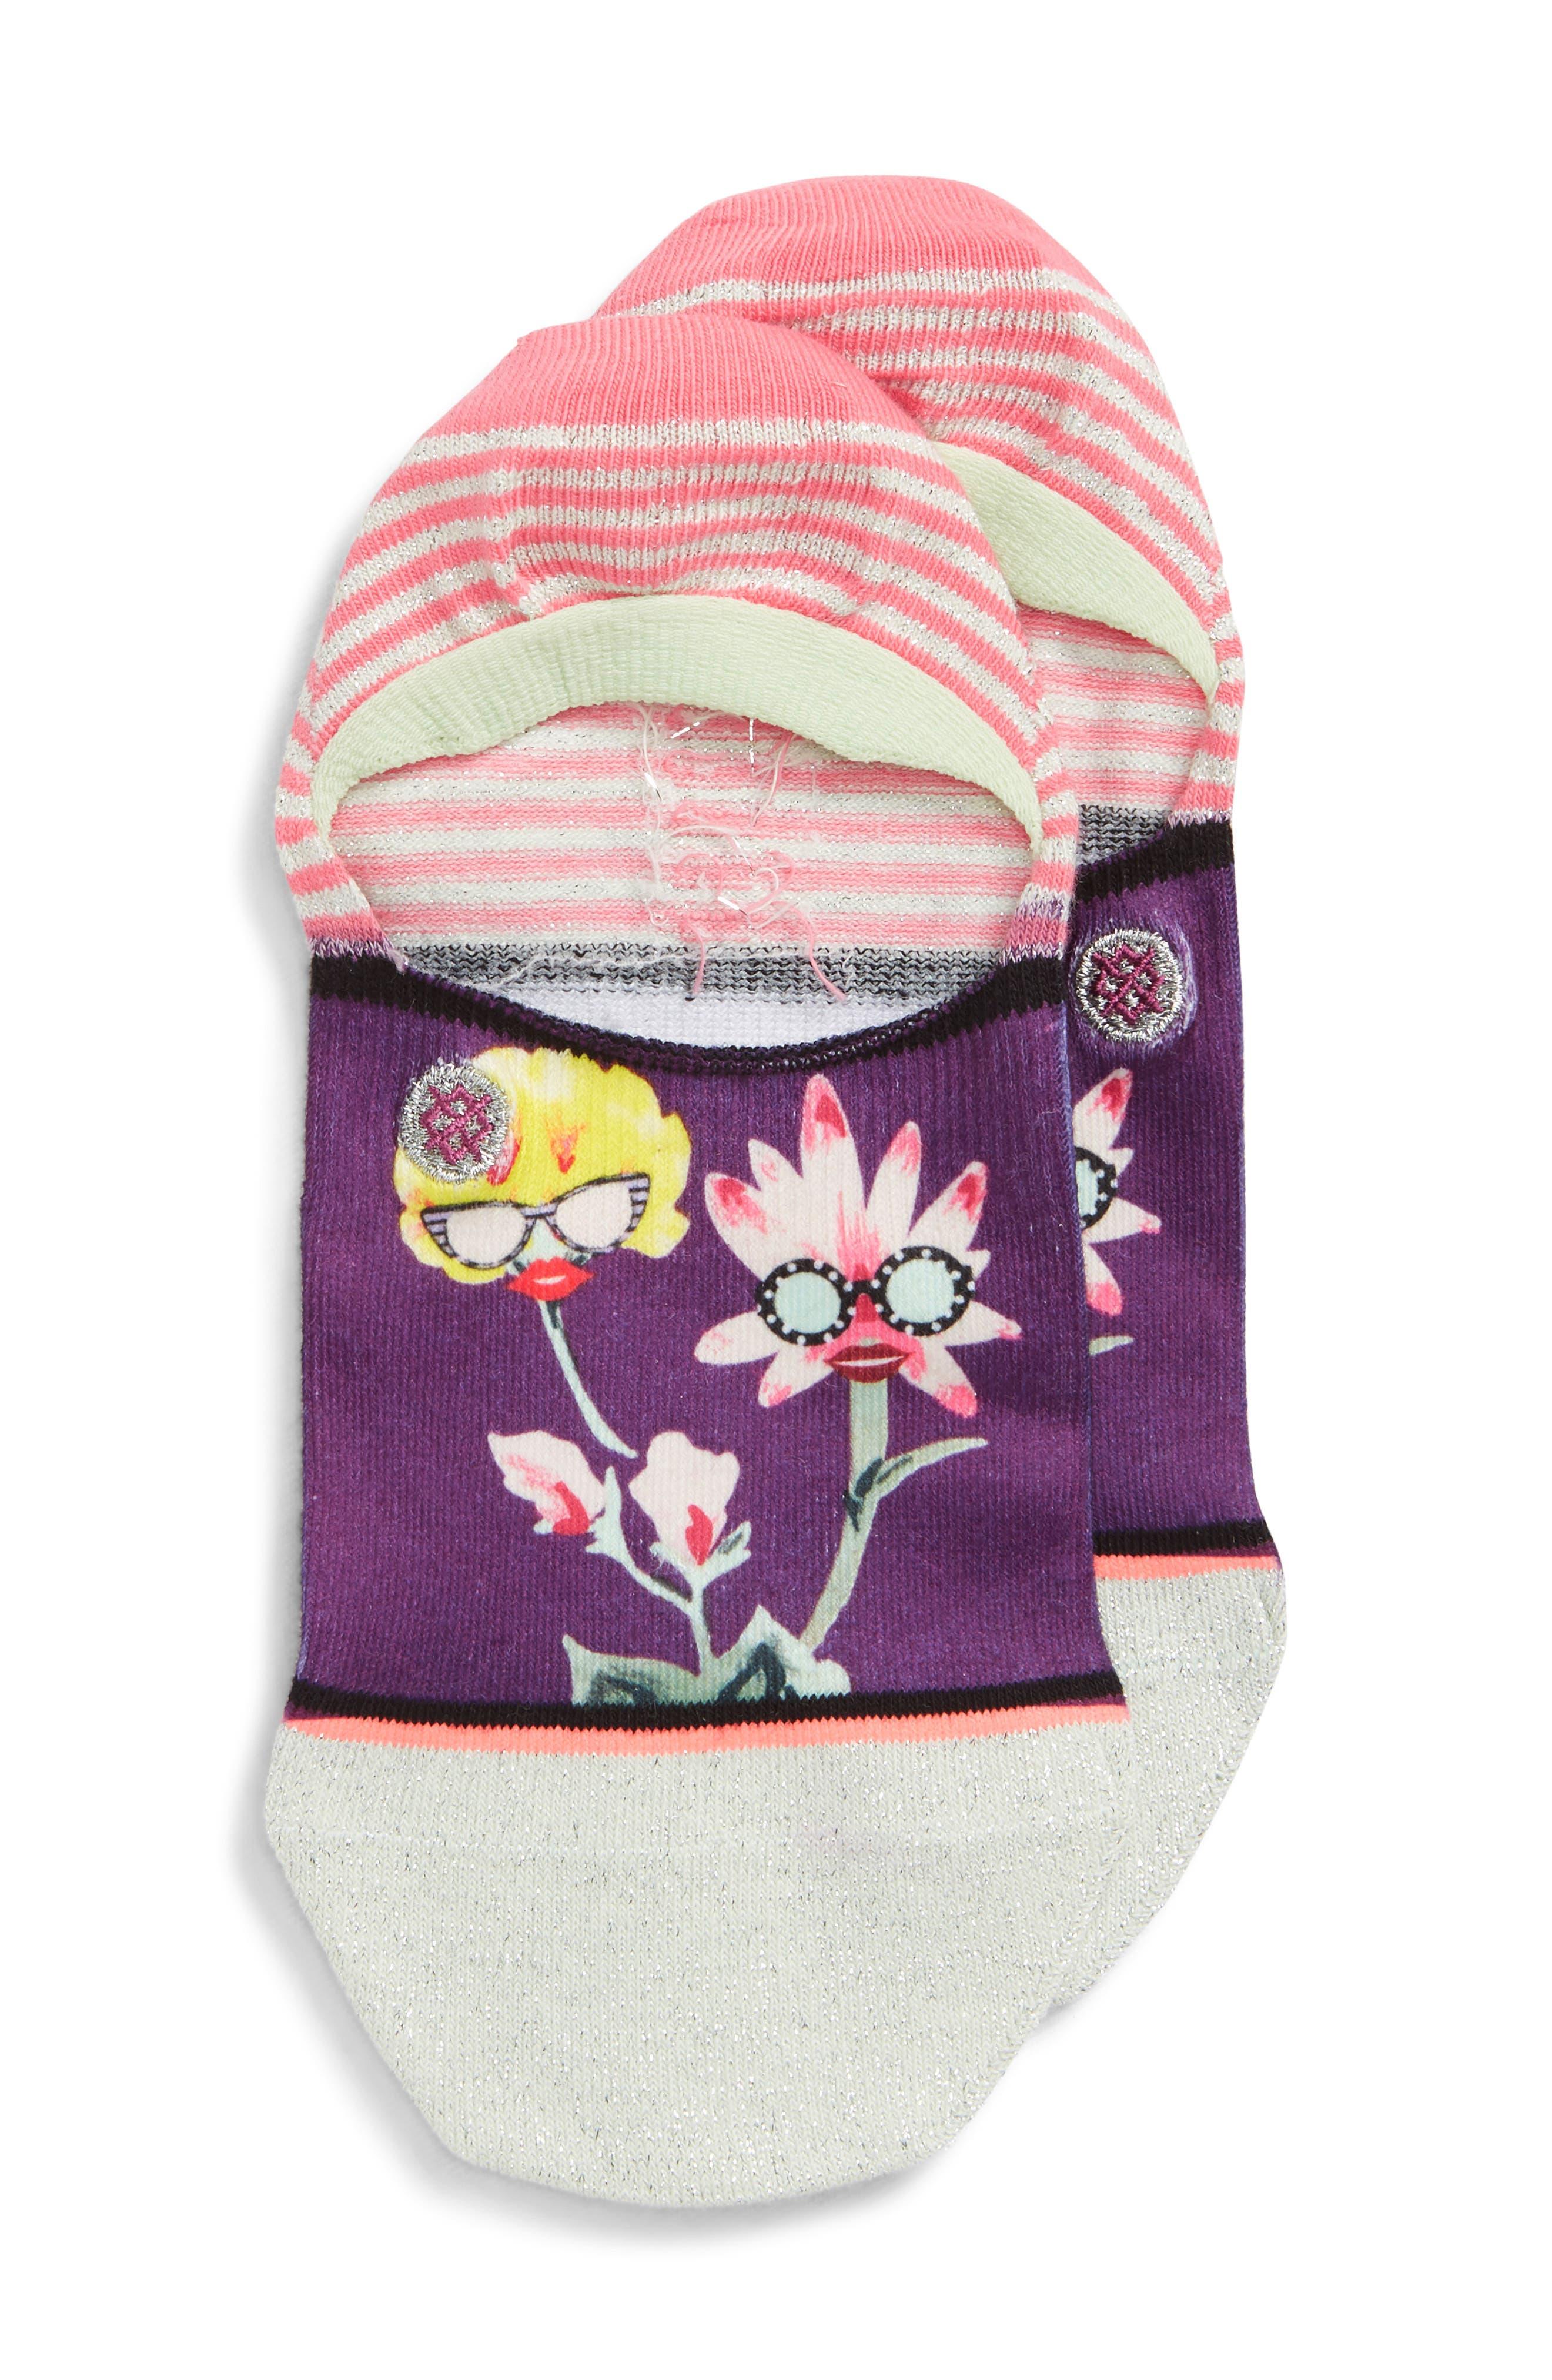 Besties No-Show Liner Socks,                             Main thumbnail 1, color,                             PURPLE